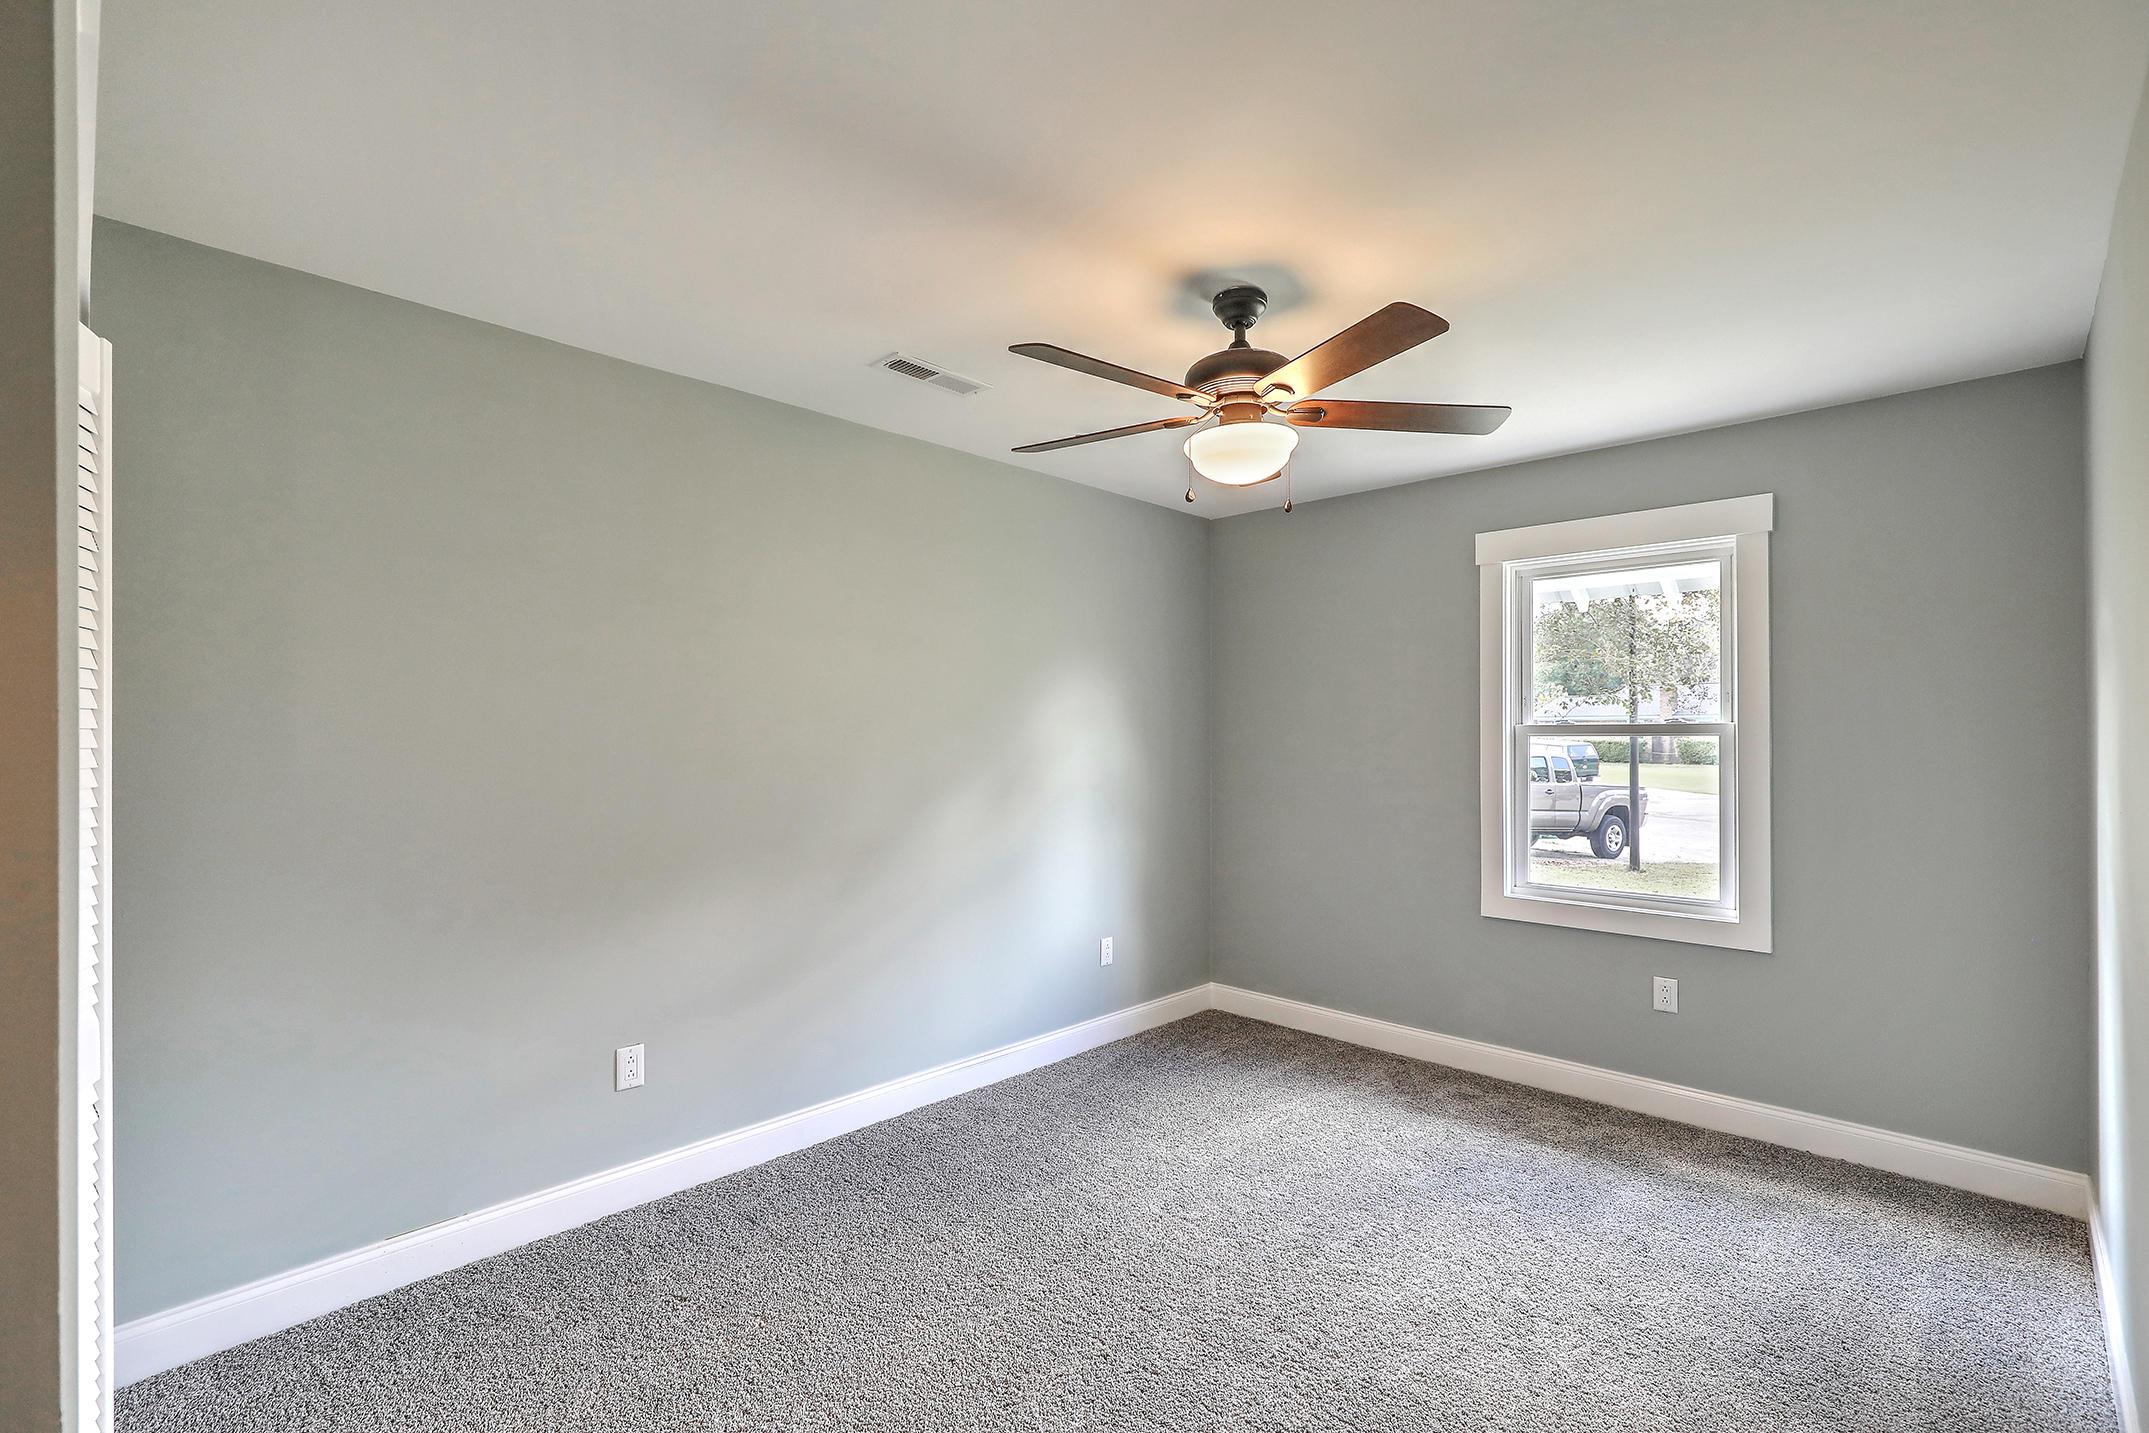 Bruno Acres Homes For Sale - 1674 Durkee, Charleston, SC - 17